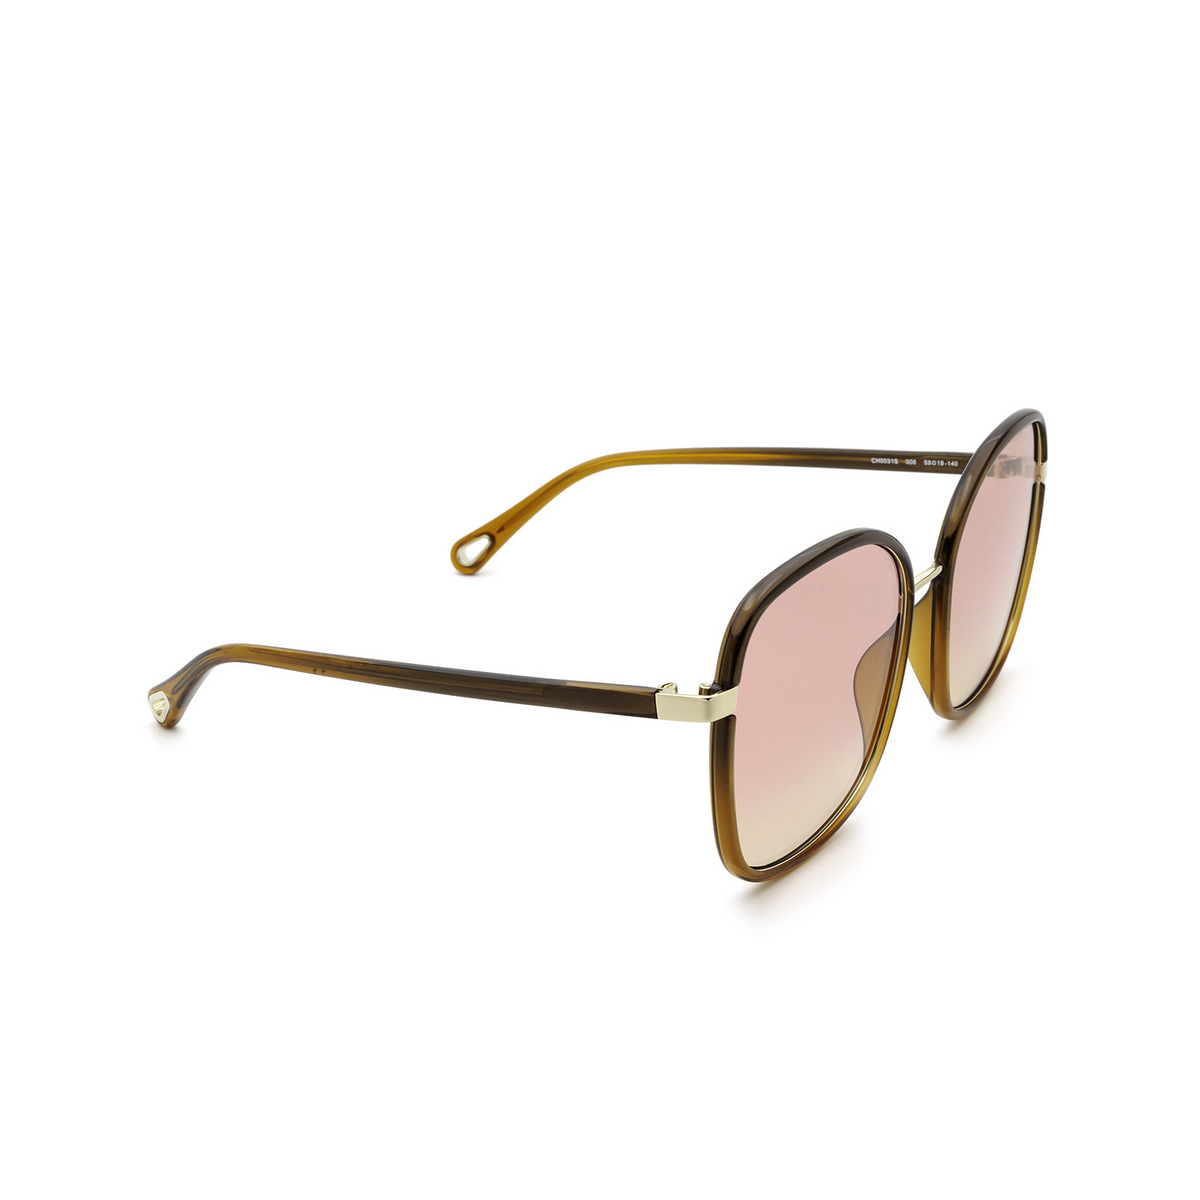 Chloé® Square Sunglasses: CH0031S color Brown 006 - three-quarters view.